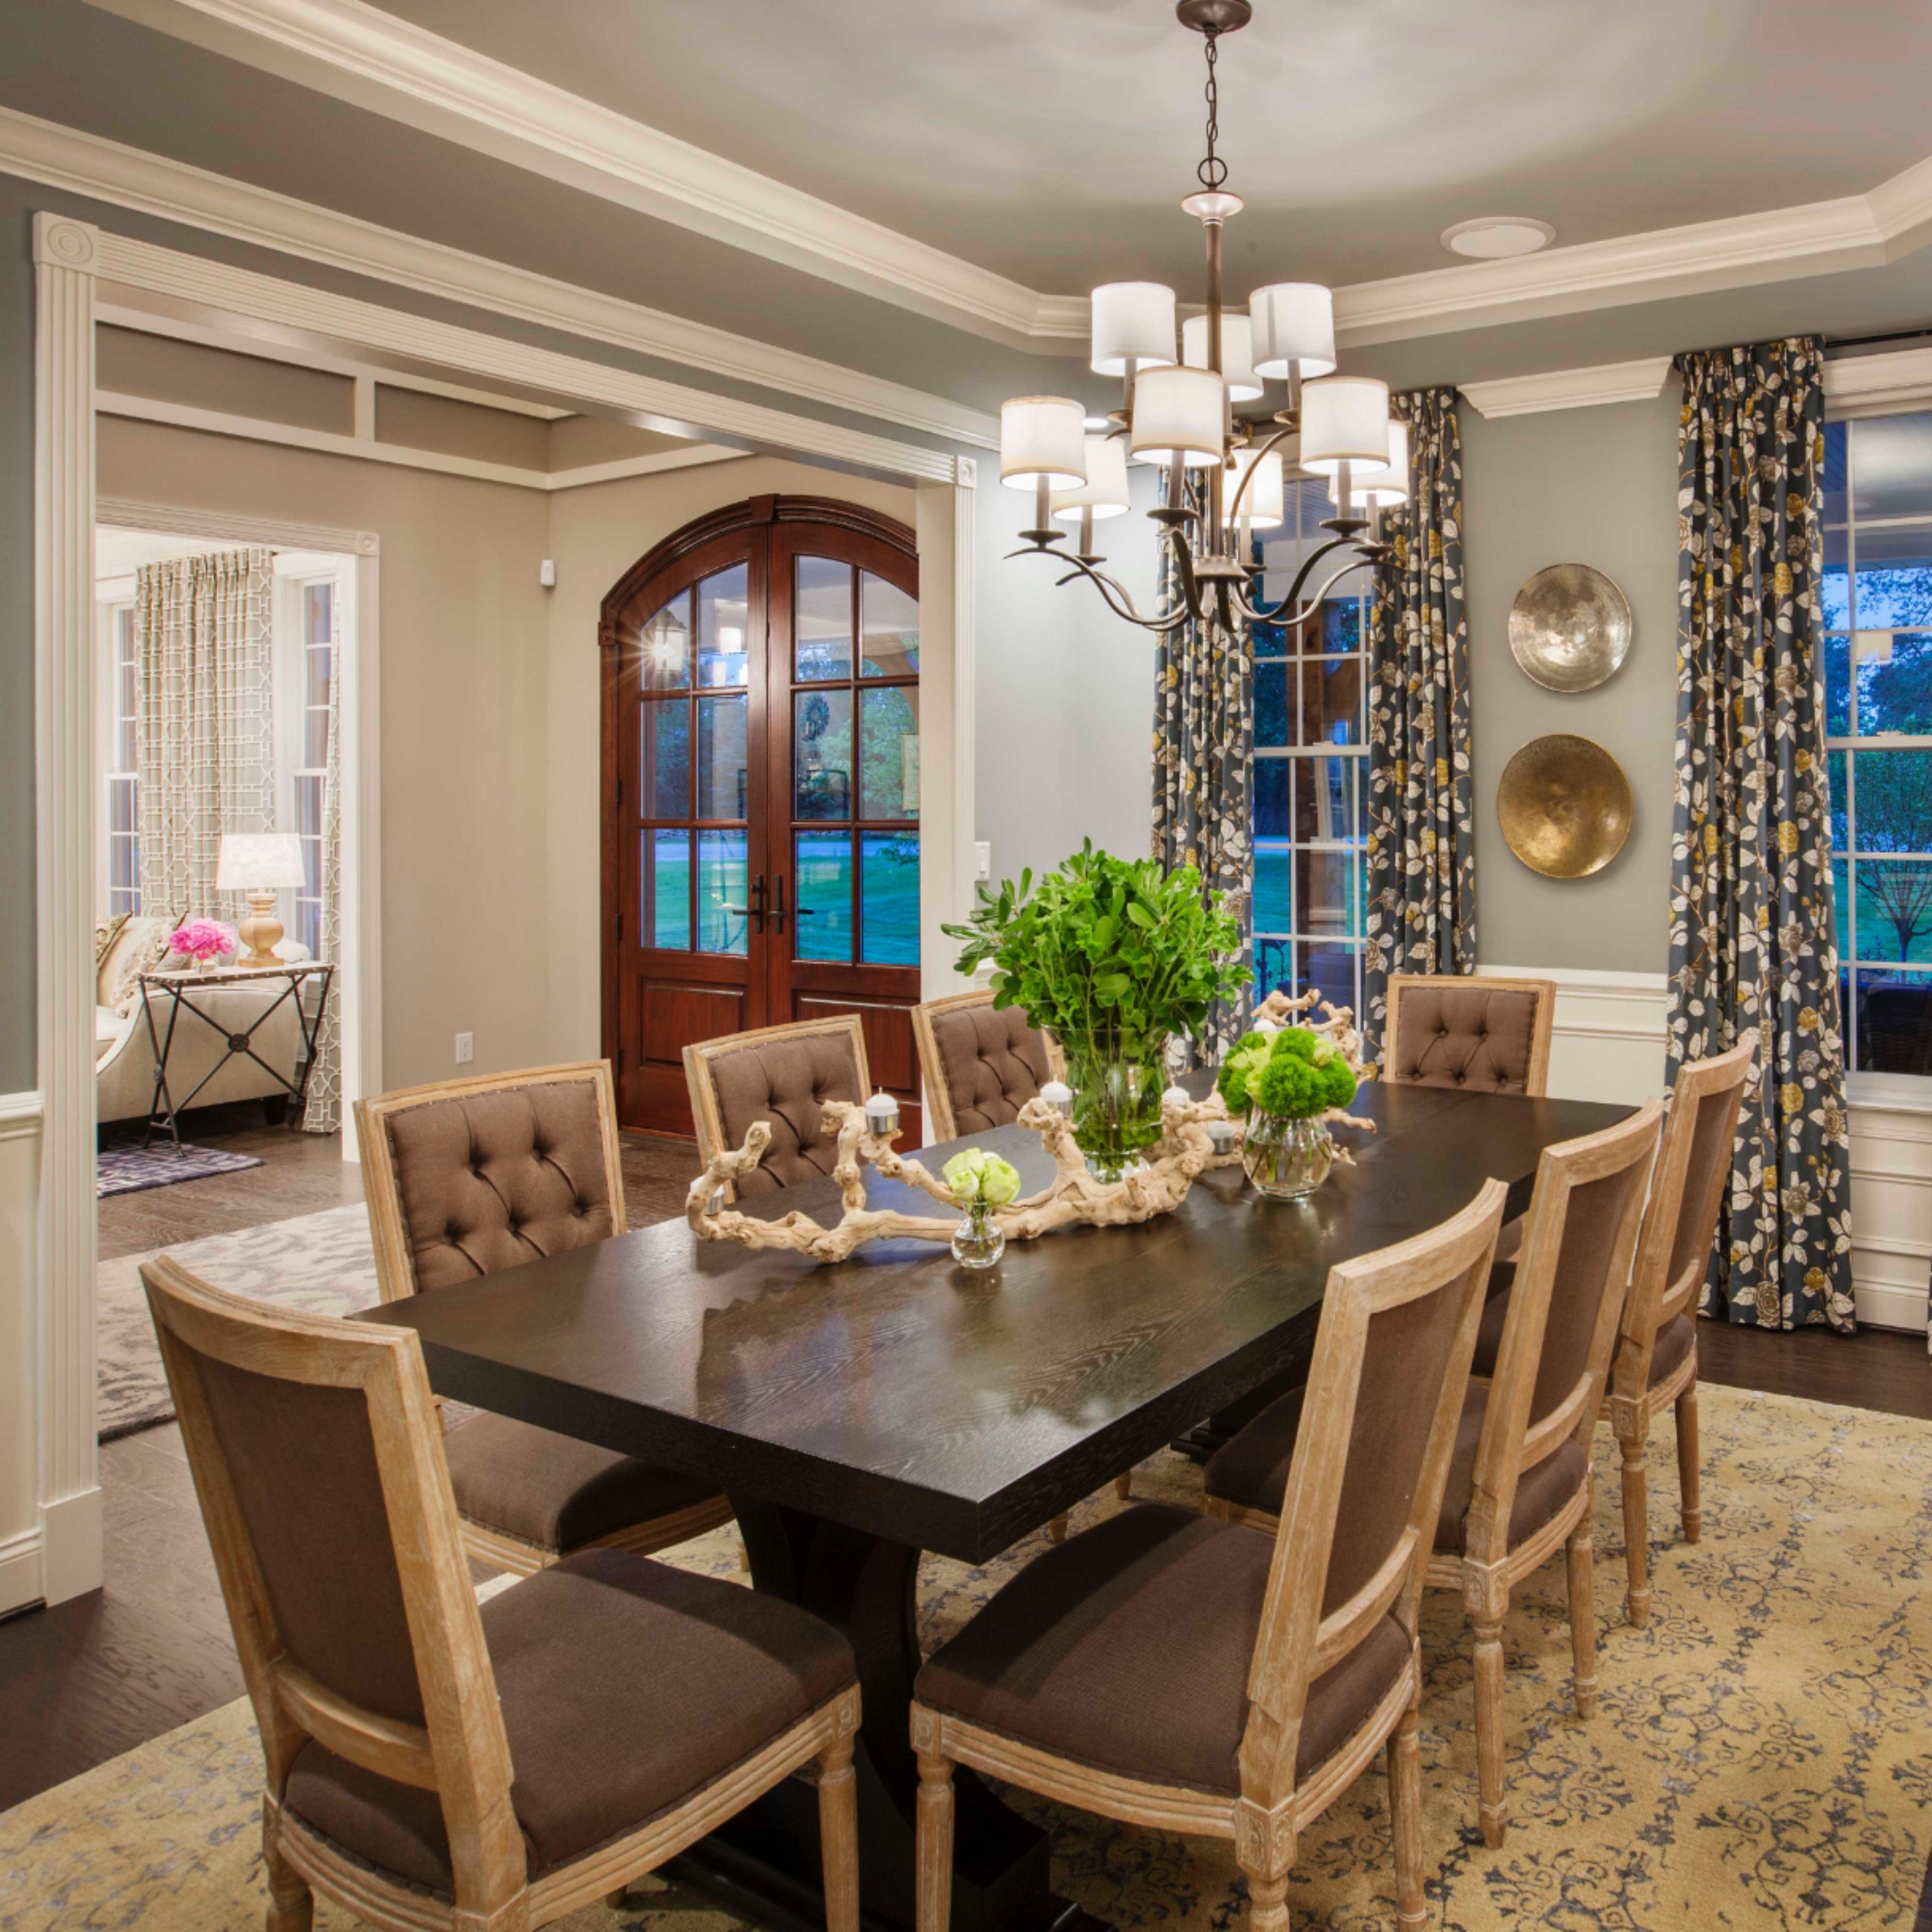 The Elegant Traditional Style Inspire Chandelier Illuminates A